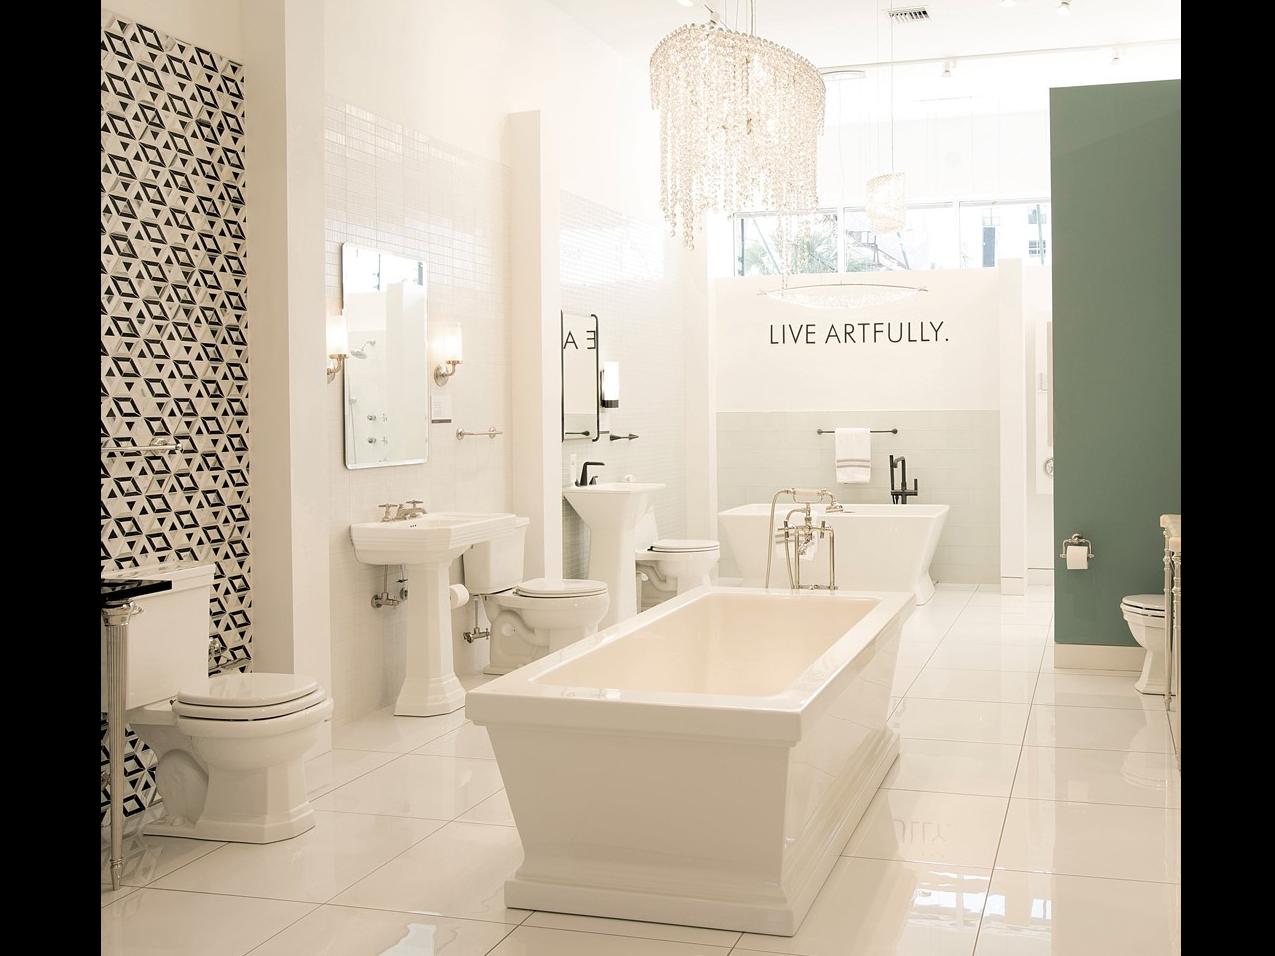 KOHLER Kitchen & Bathroom Products at Blackman Showroom in Mineola, NY